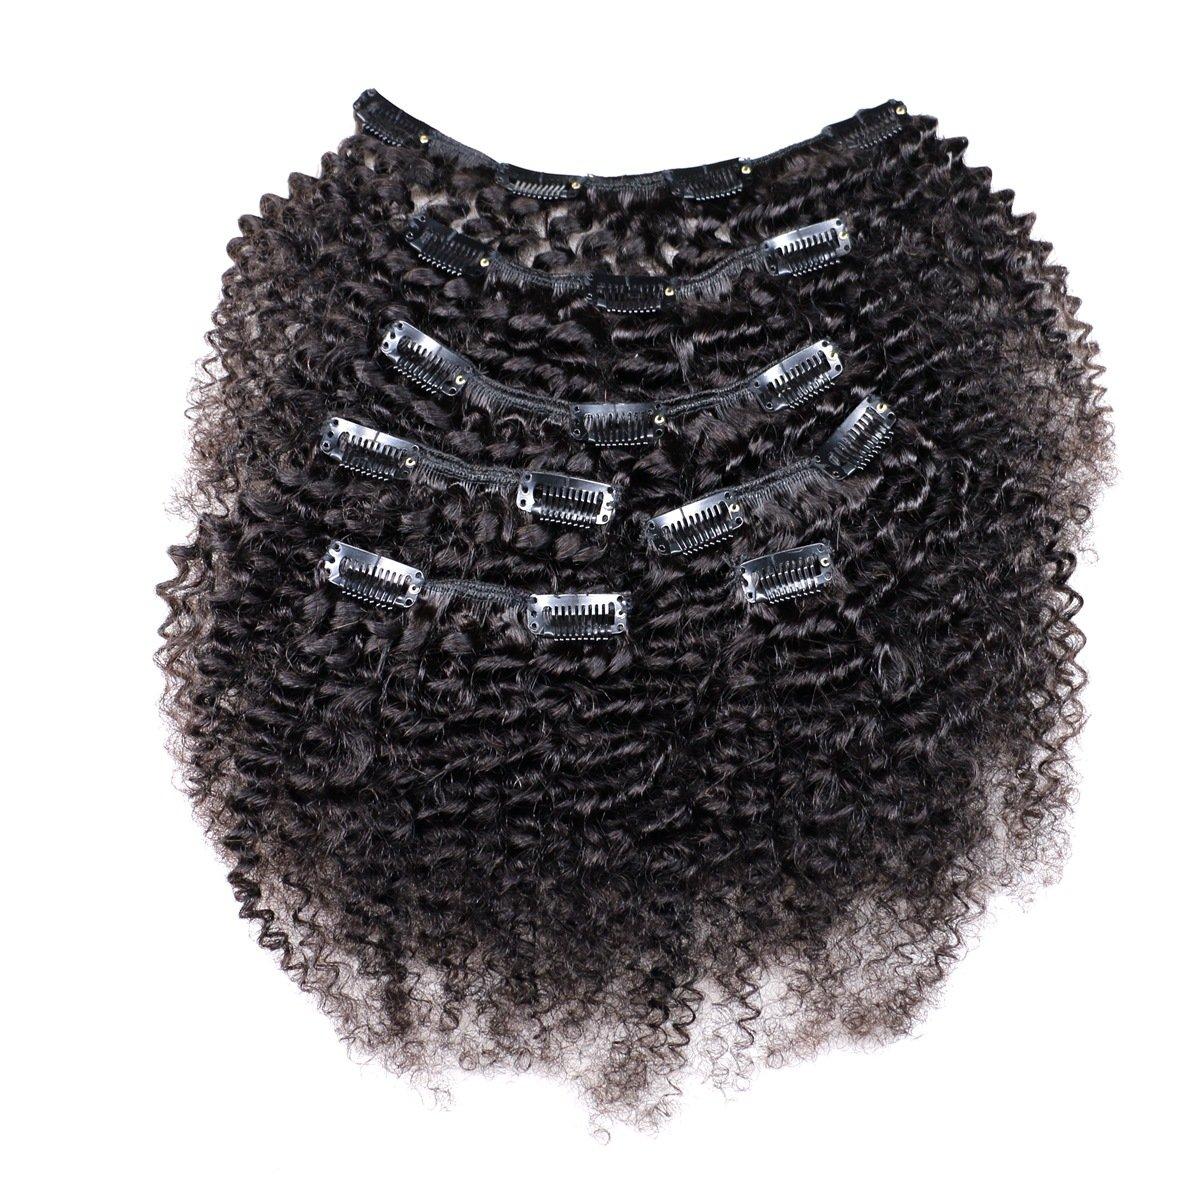 KeLang Hair African American Afro Kinky Curly Clip In Human Hair Extensions Brazilian Virgin Hair Natural Color 4B 4C Afro Kinky Curly Clip Ins For Black Women 12inch 7pcs/lot,120gram/set